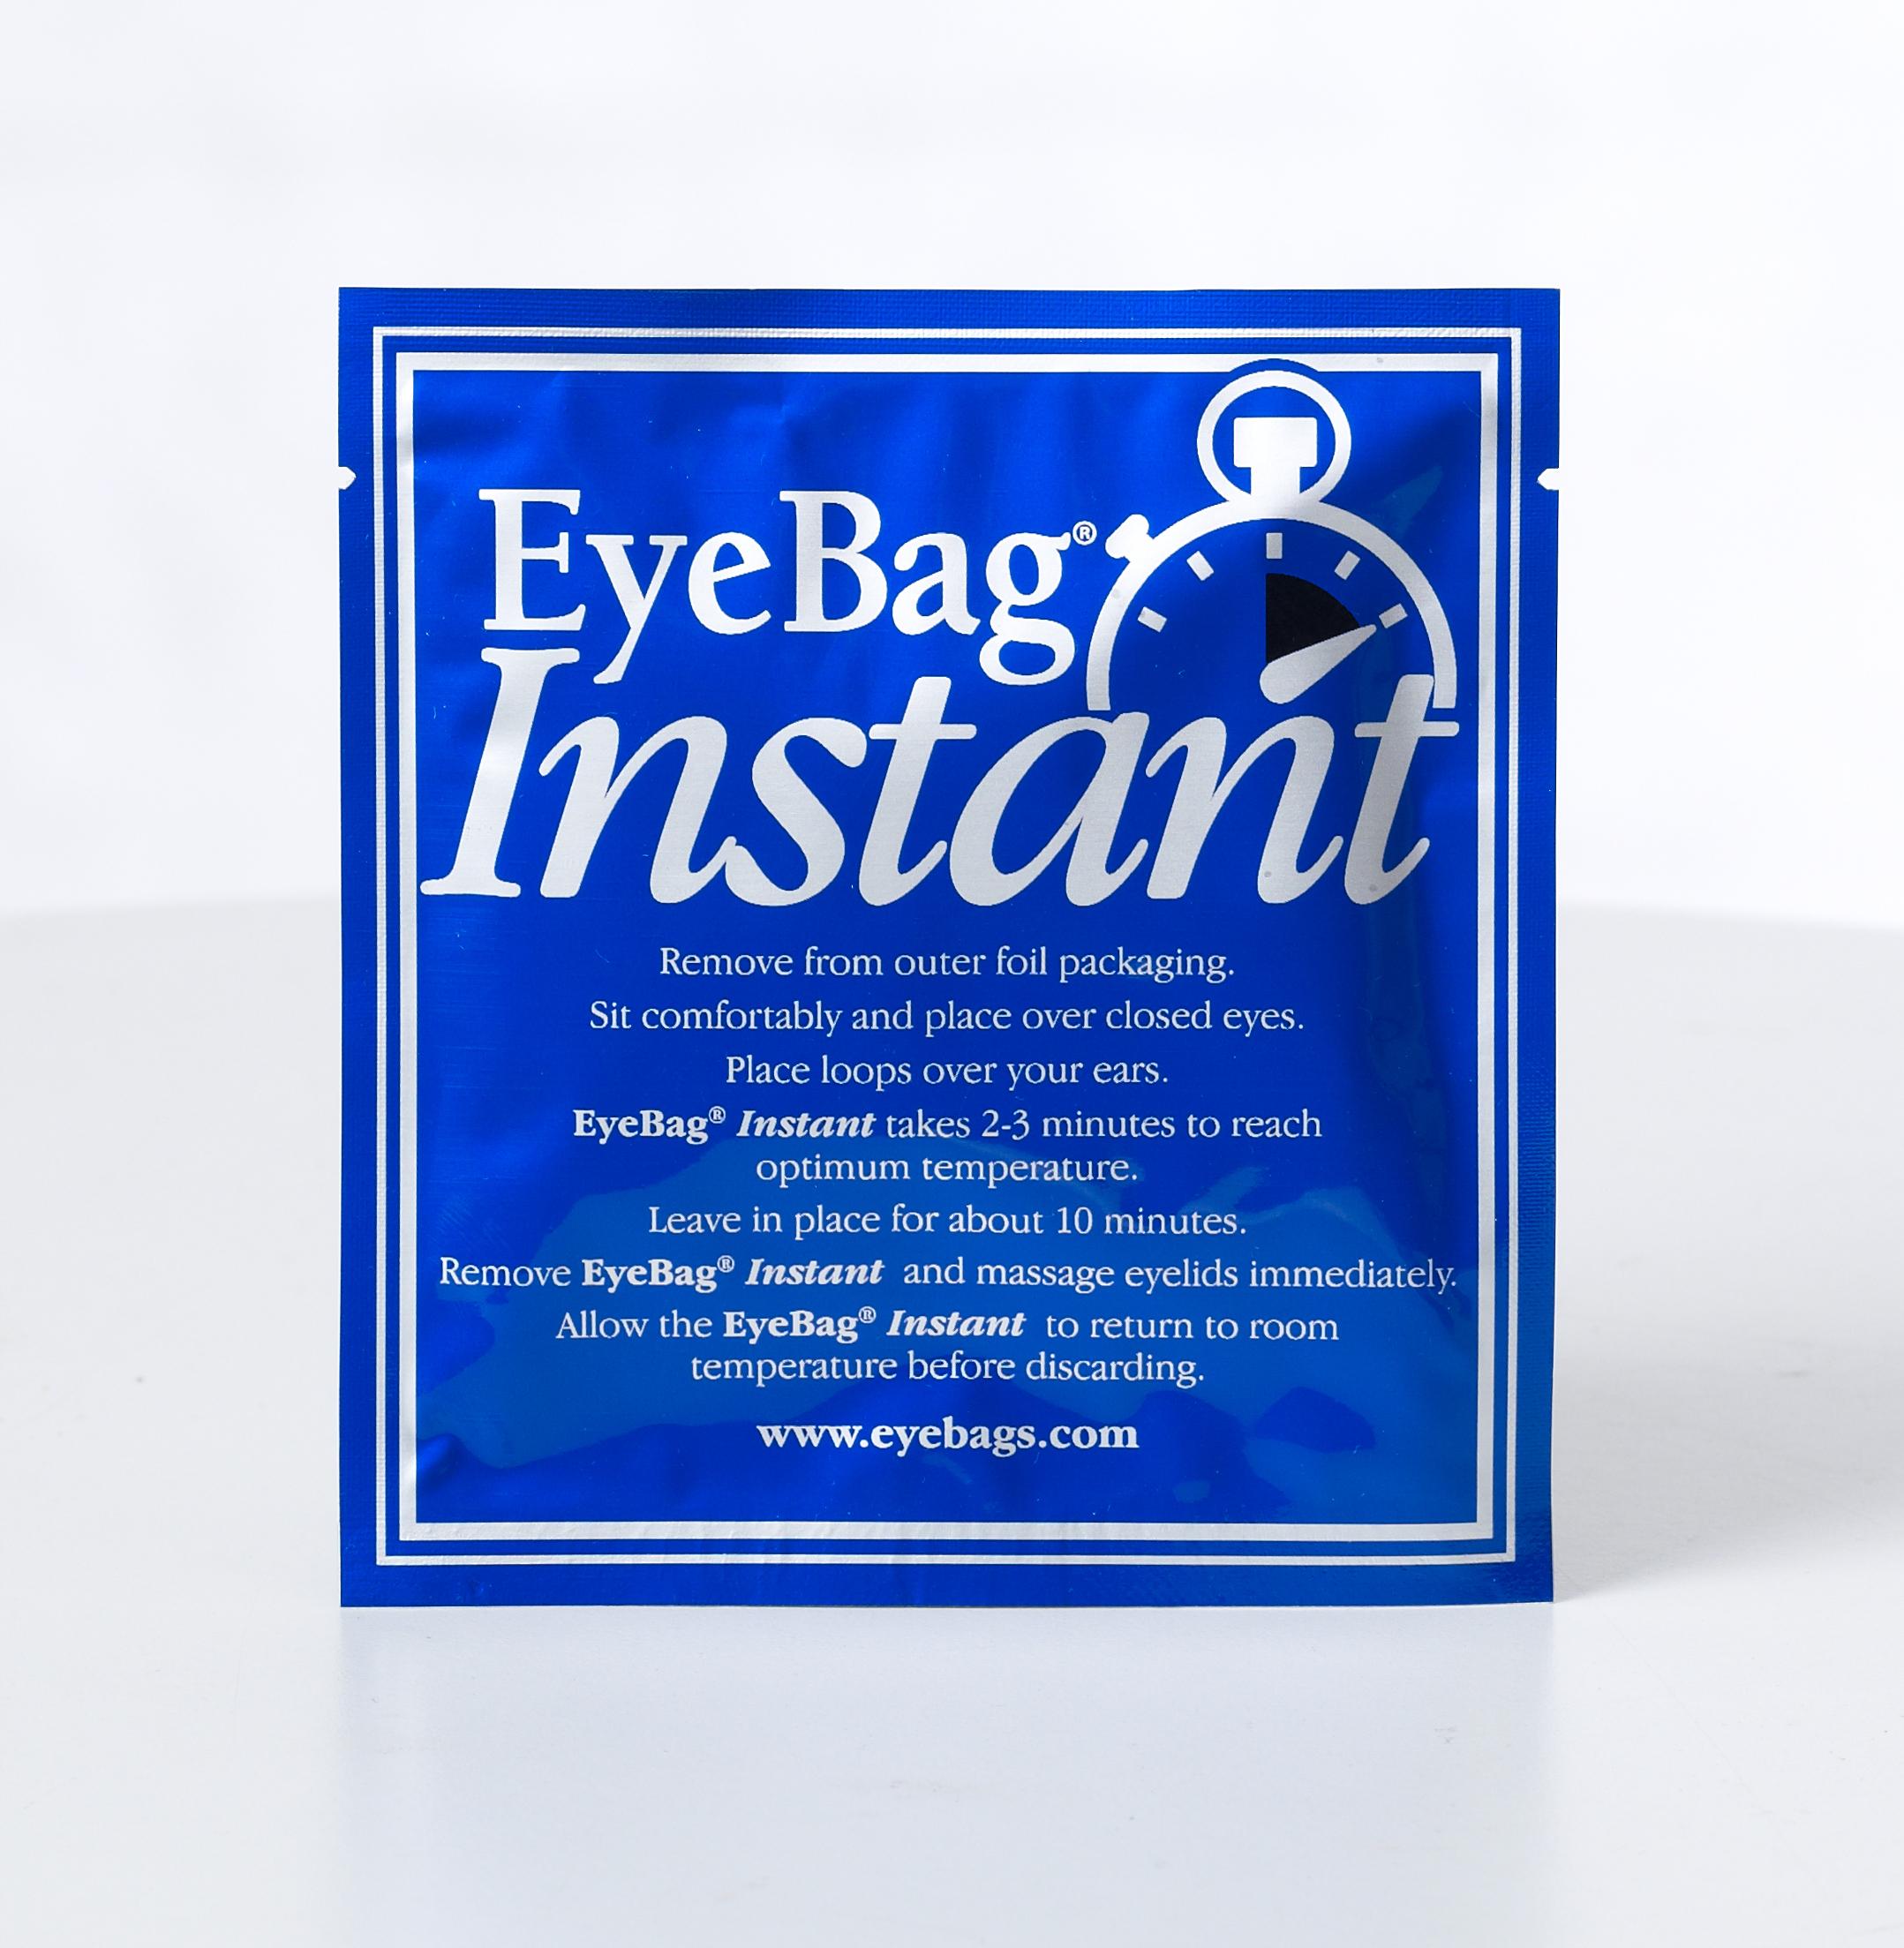 mgdrx eye bag instructions